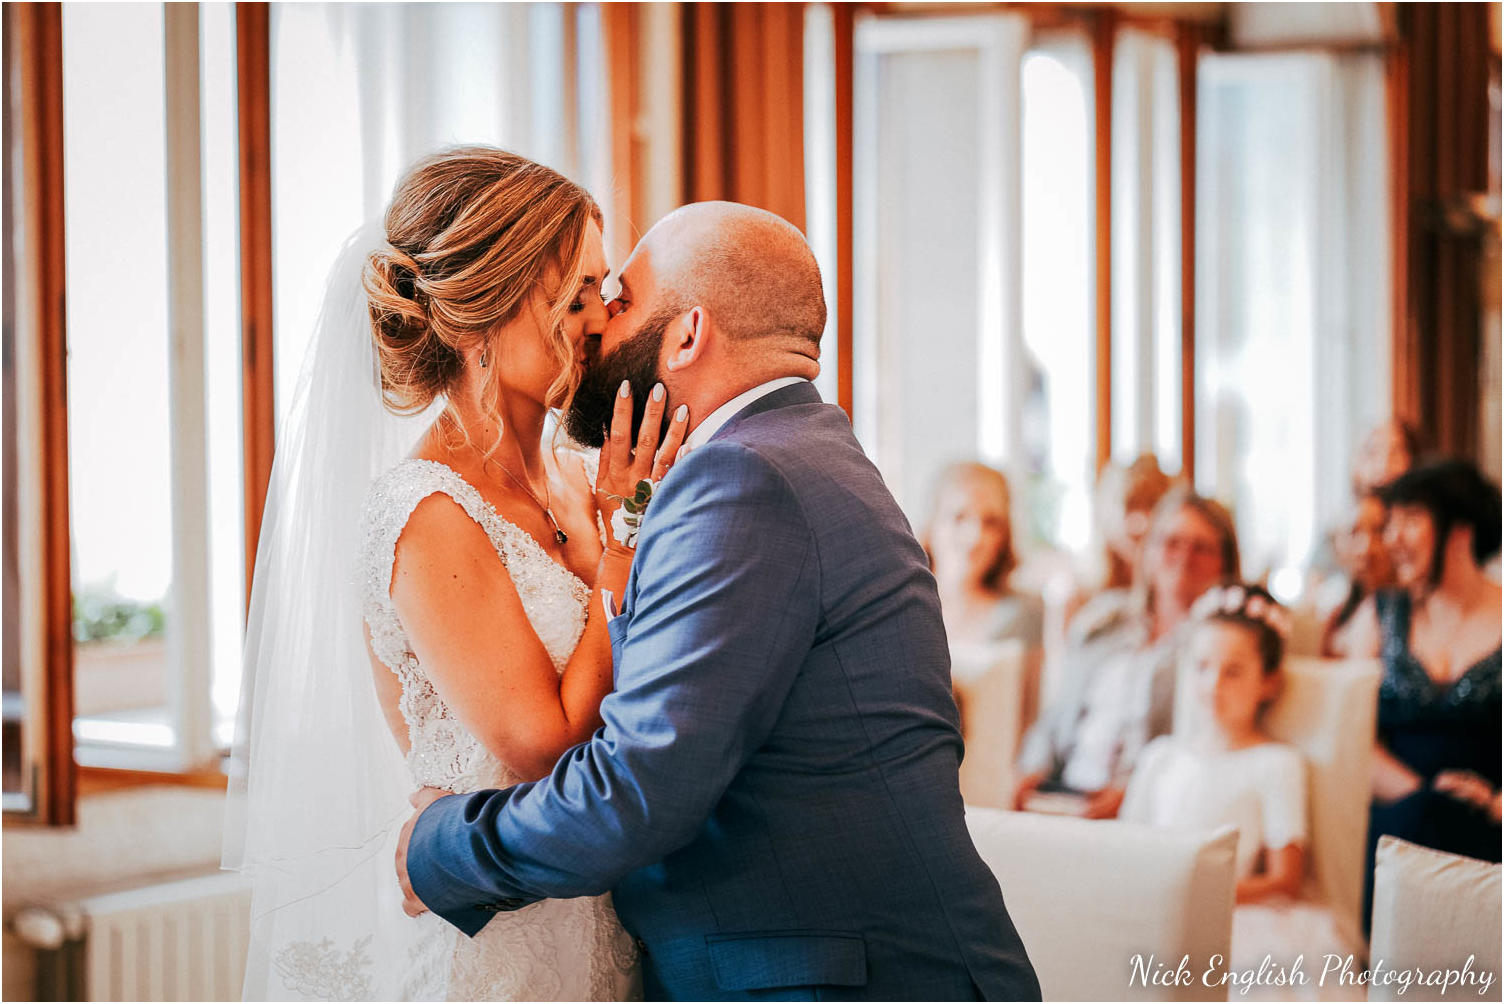 Destination_Wedding_Photographer_Slovenia_Nick_English_Photography-45.jpg